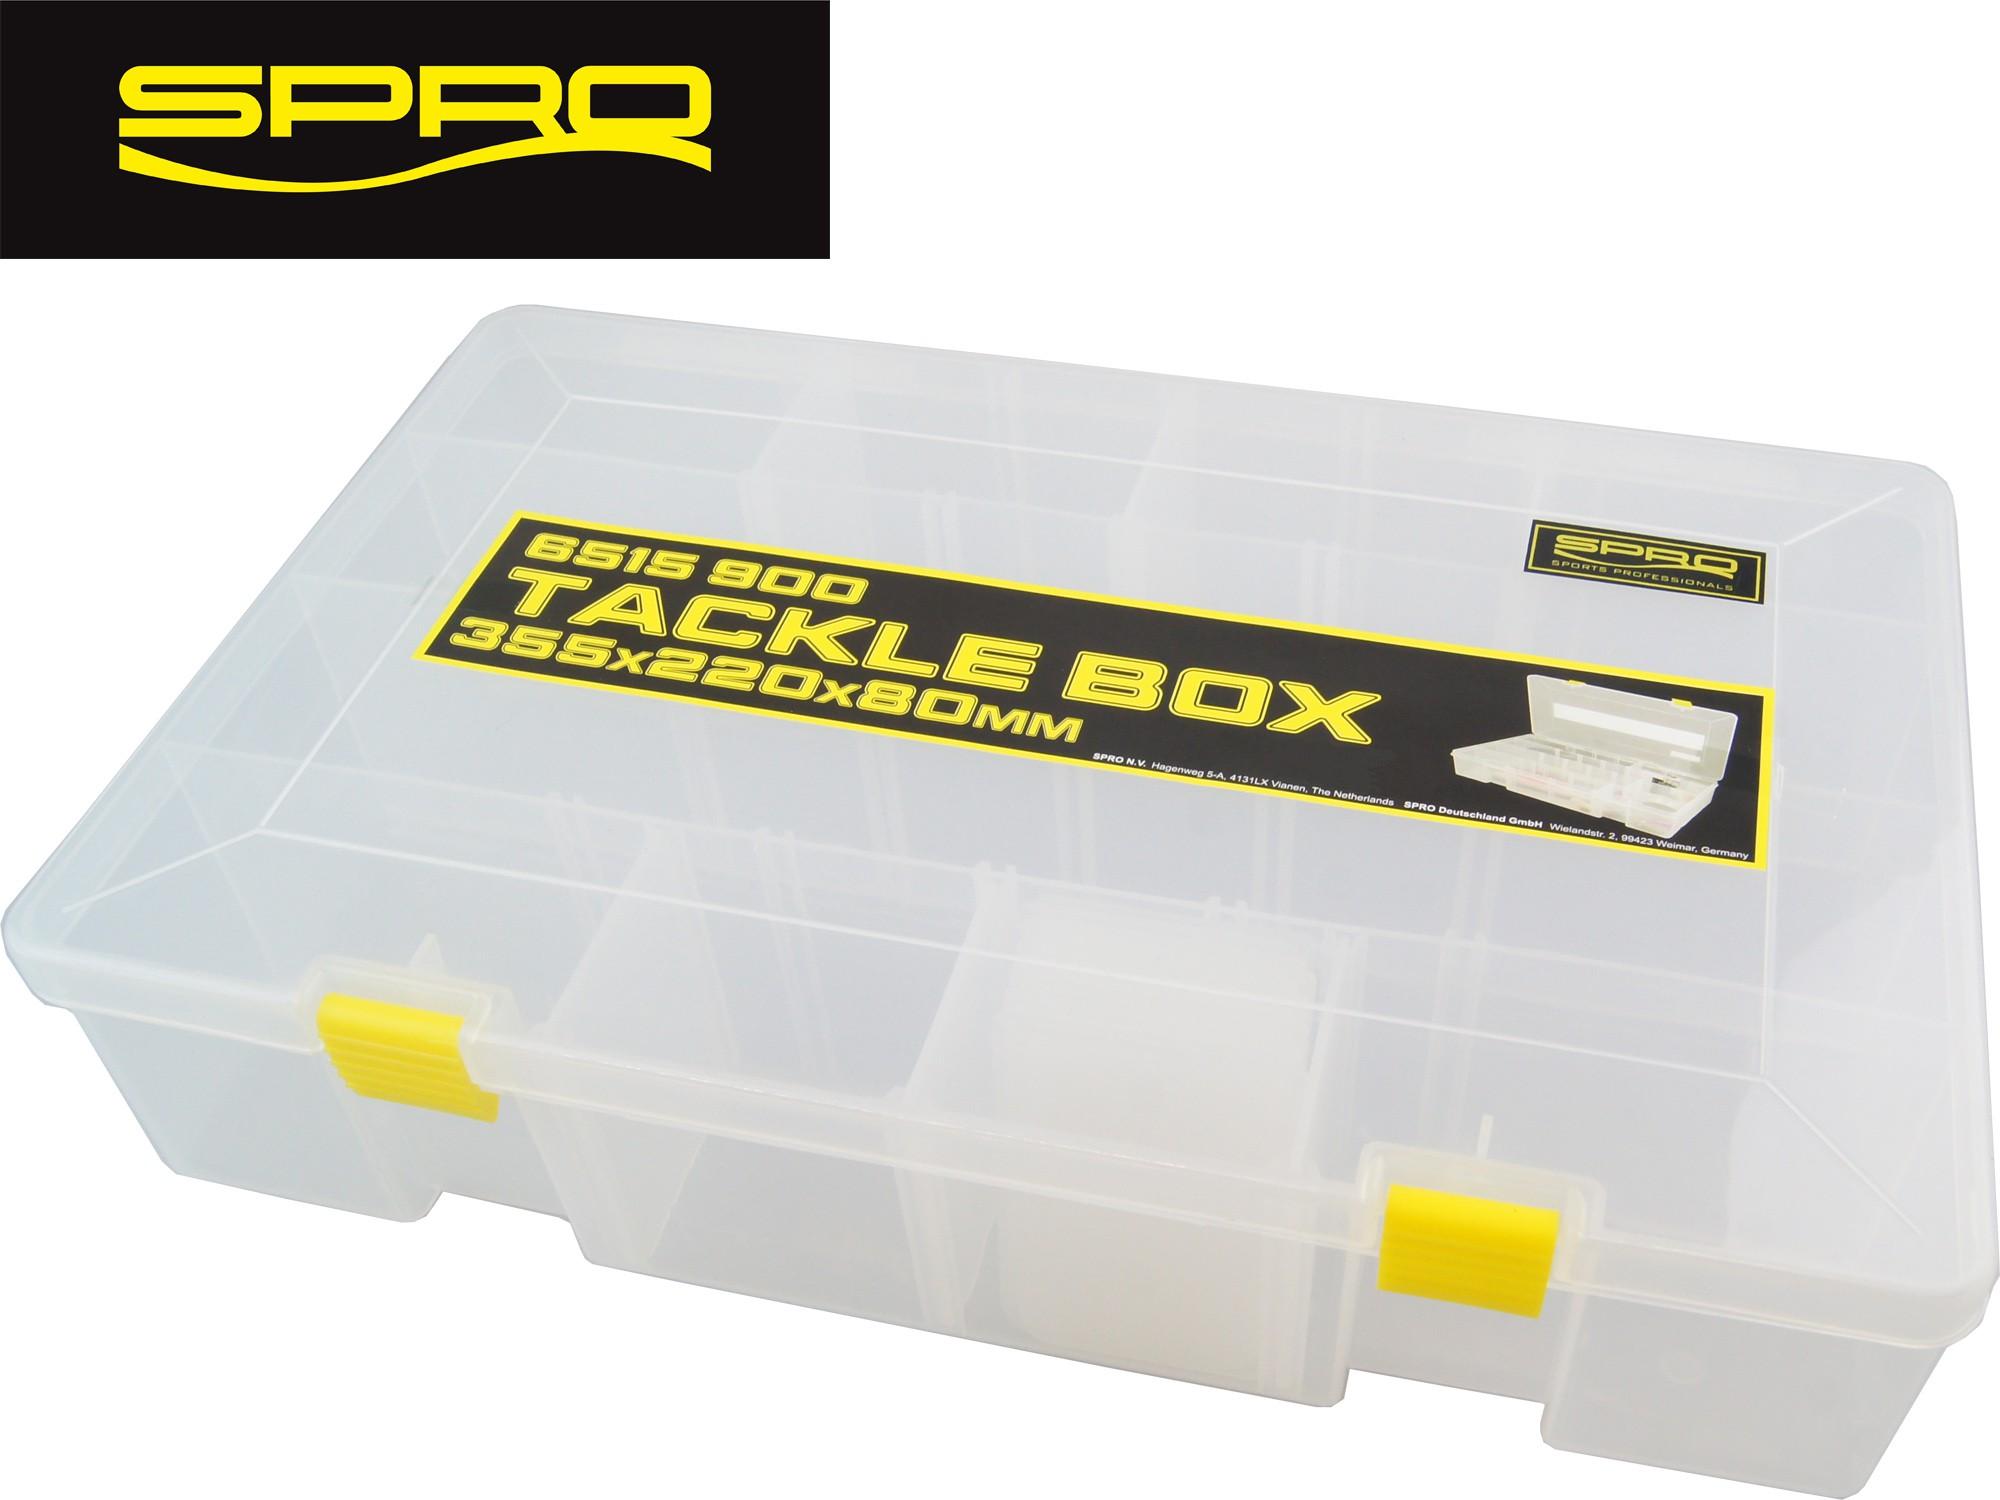 Kunstköderbox Spro FreeStyle Rigged Box L